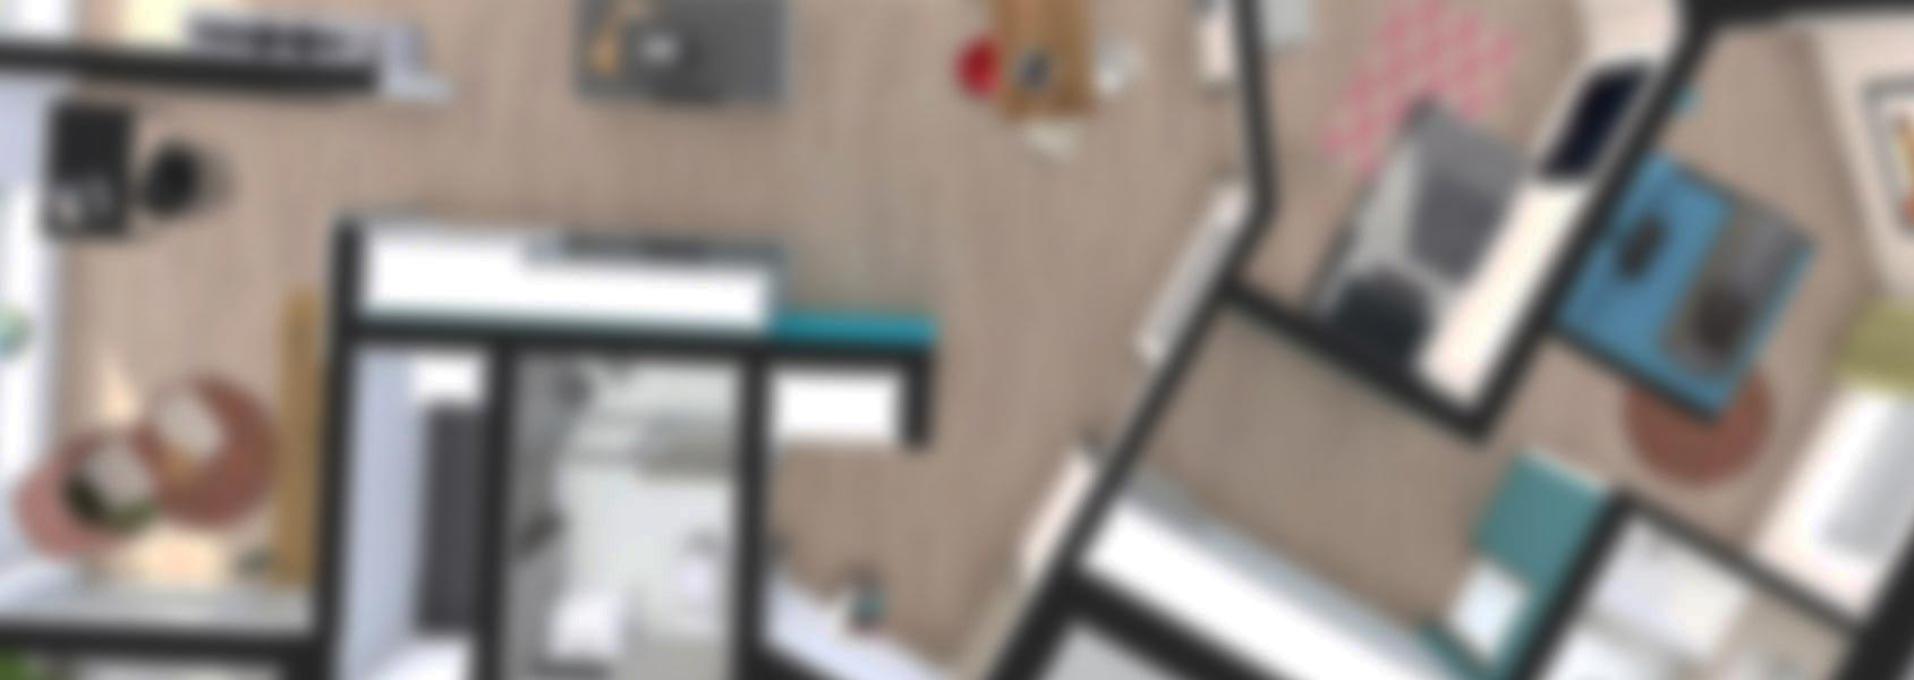 floorplanback-2